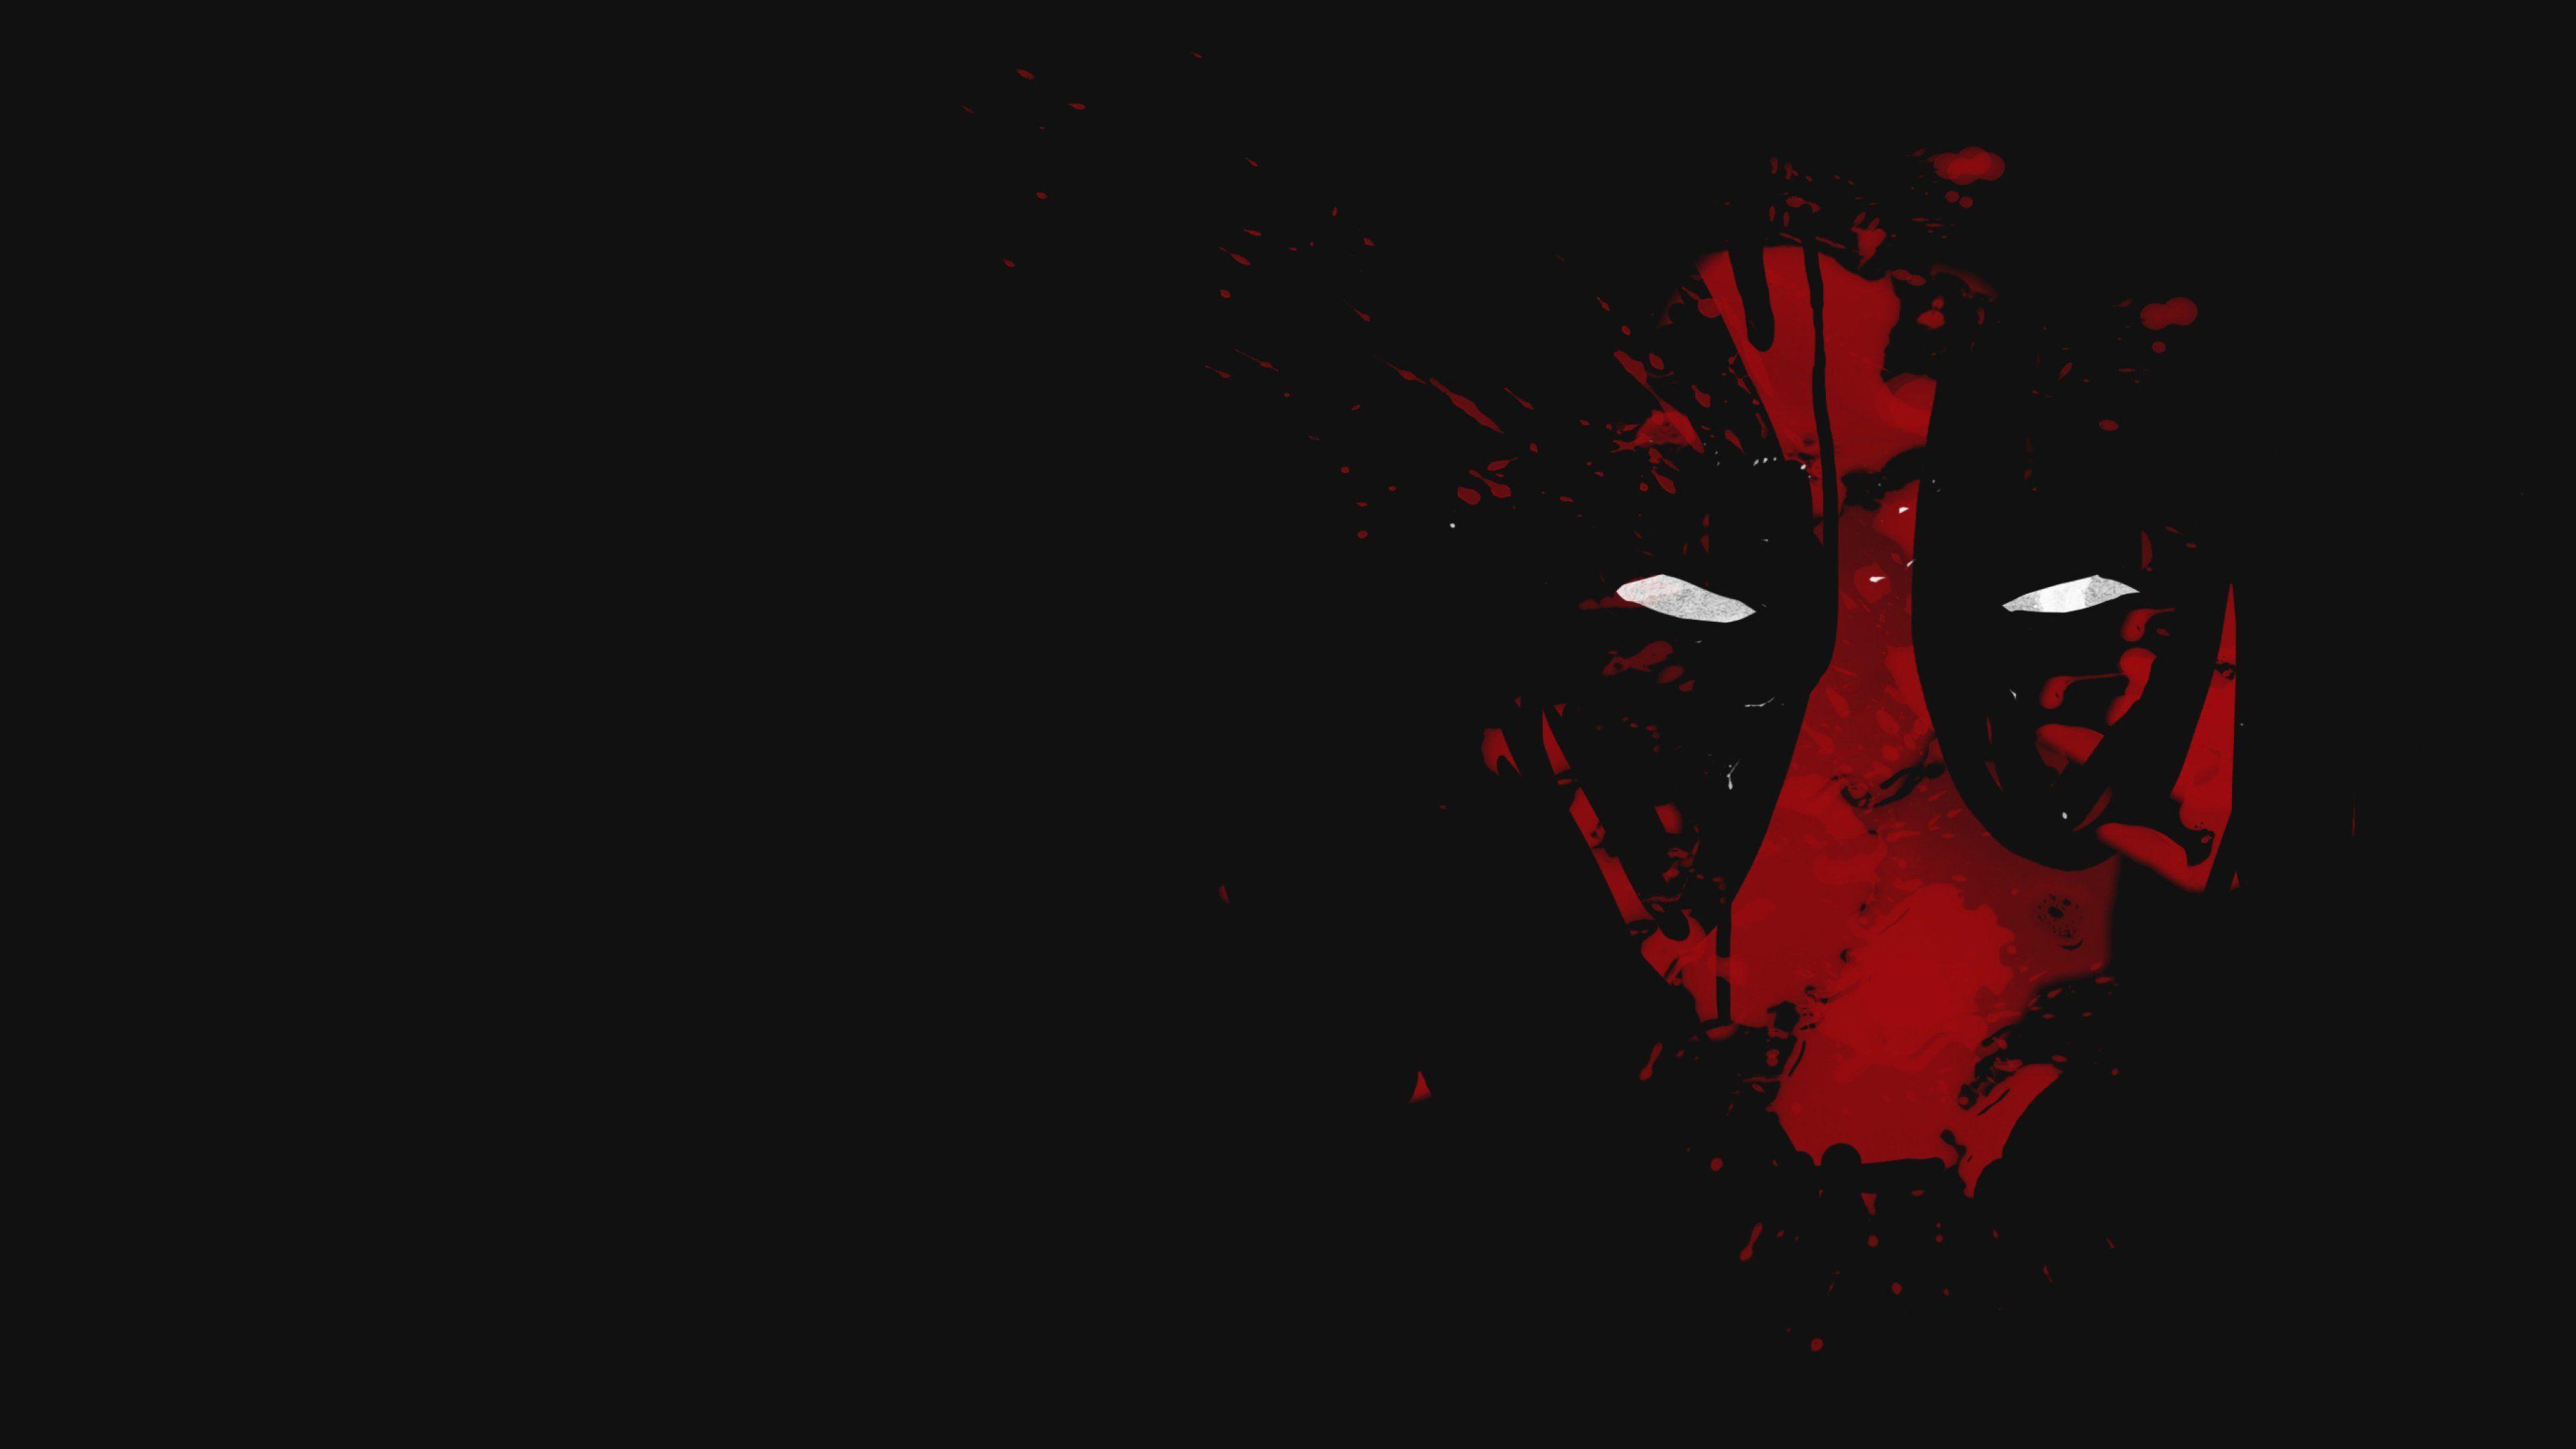 Deadpool Laptop Wallpapers Top Free Deadpool Laptop Backgrounds Wallpaperaccess